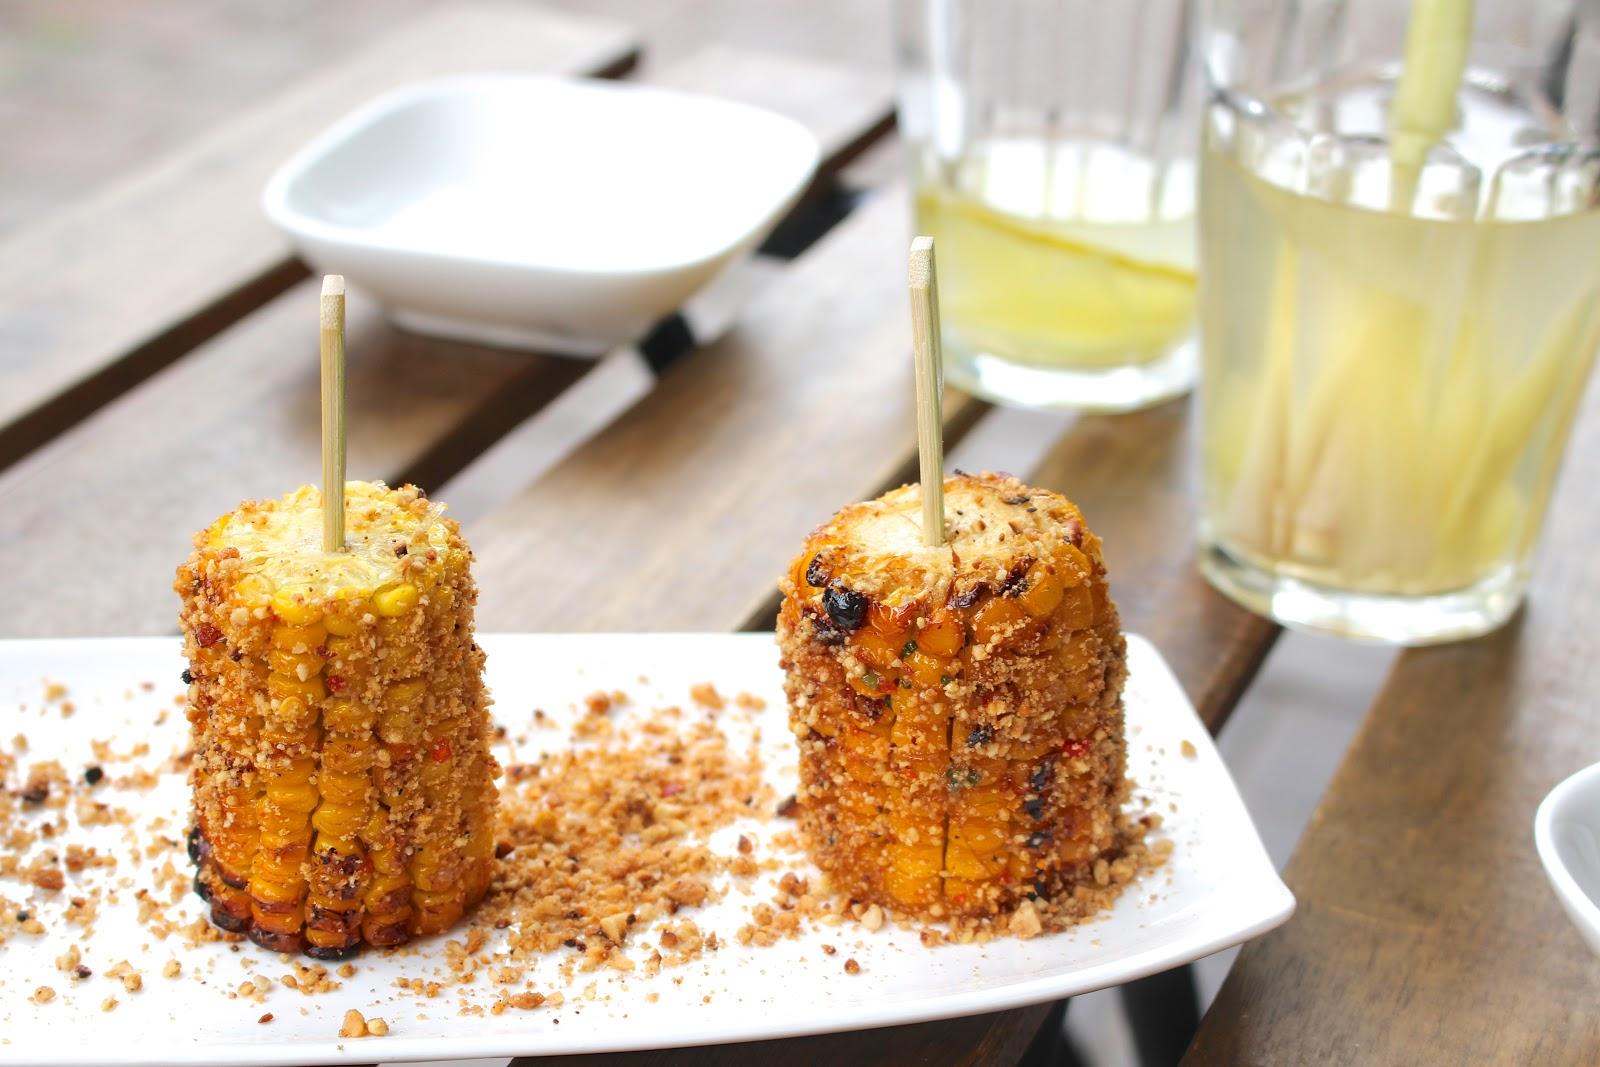 Bắp nướng Bún Antwerp sweetcorn